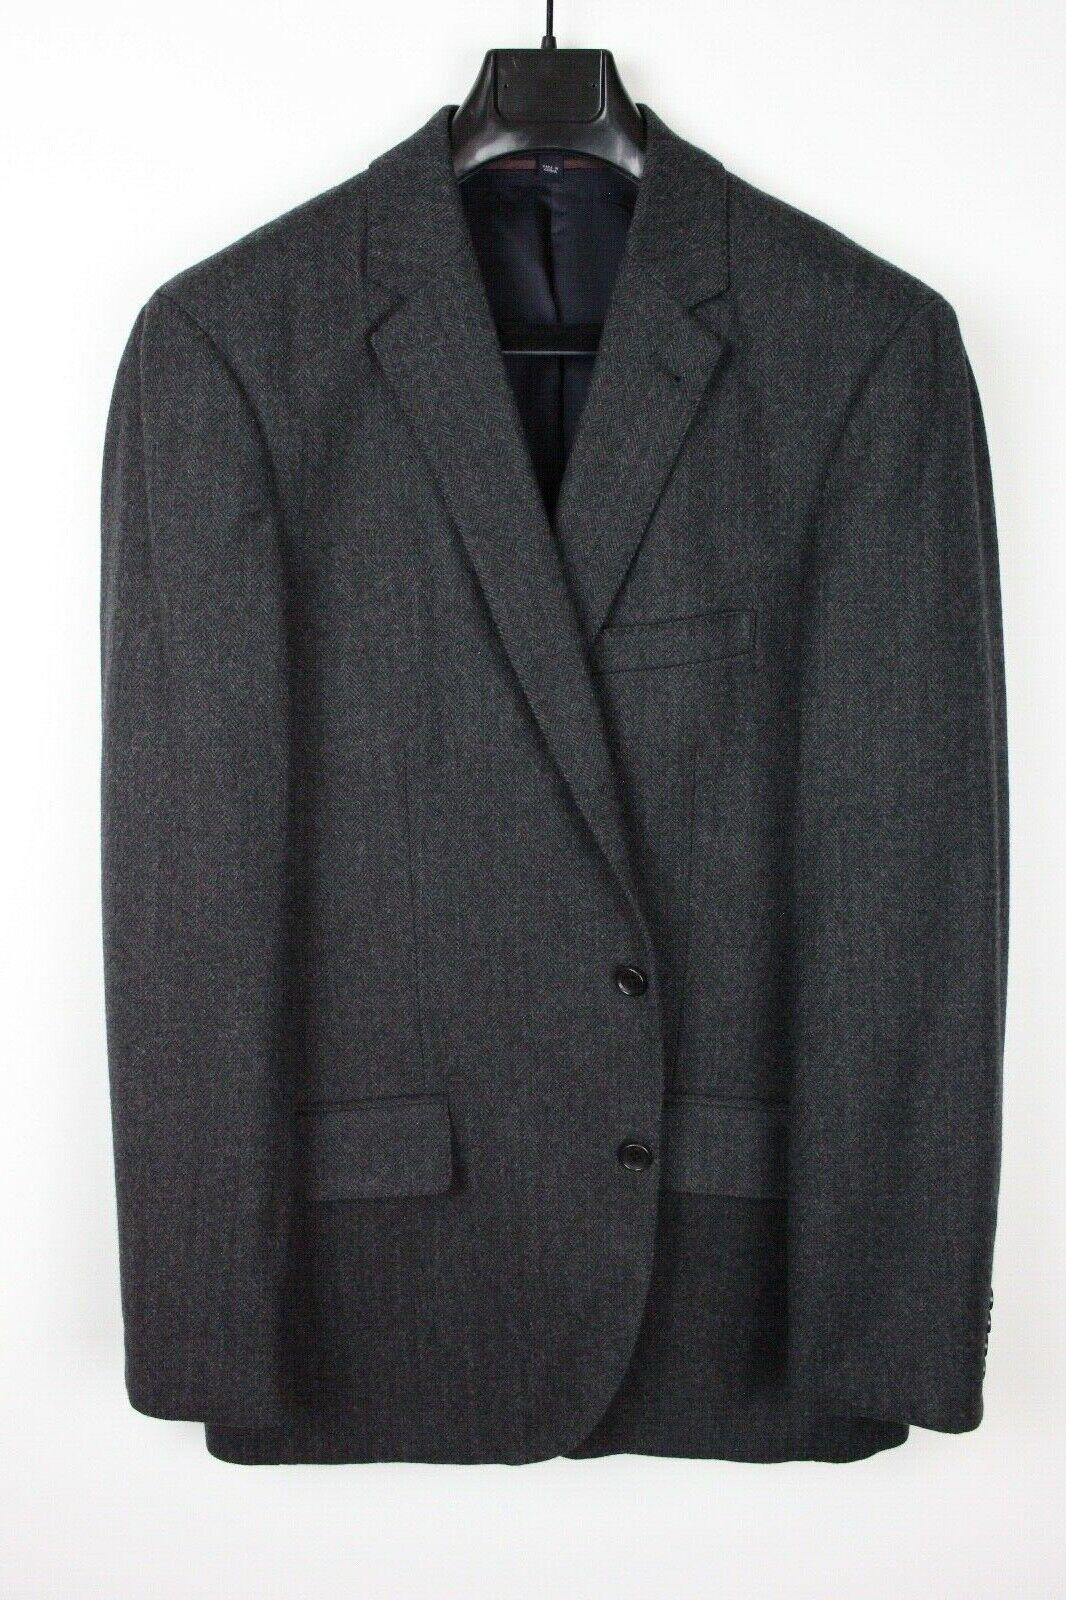 J. CREW  Aldridge  Yorkshire Tweed Moon Cloth Blazer Sport Coat, Größe 44R